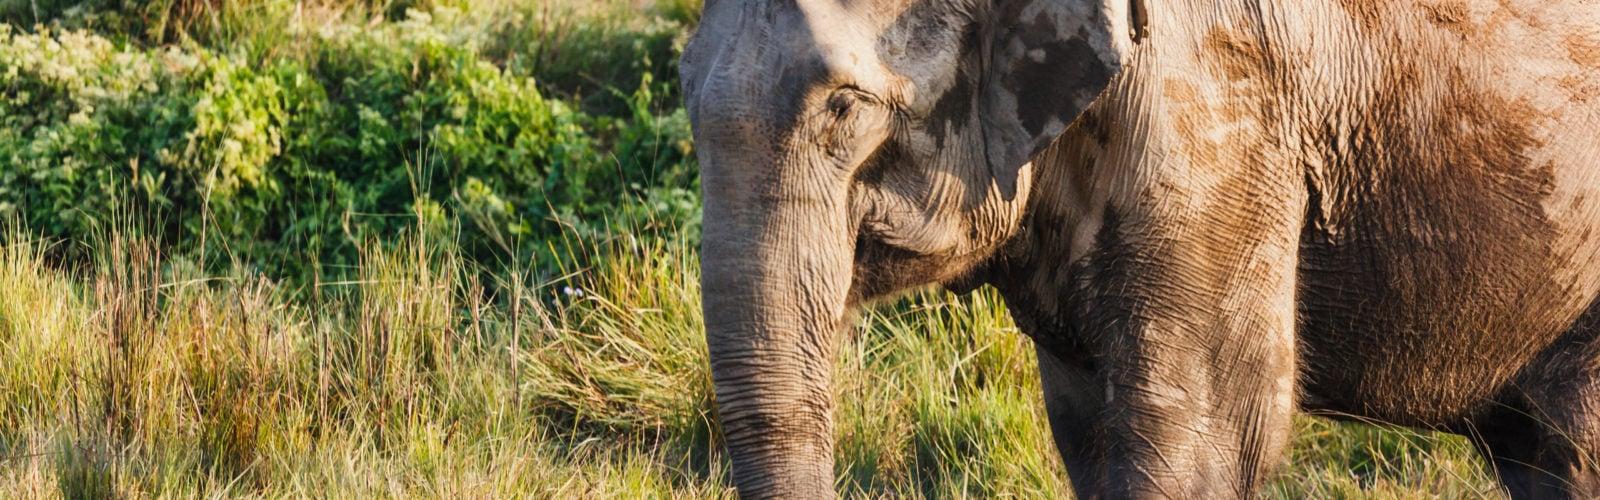 chitwan-elephant